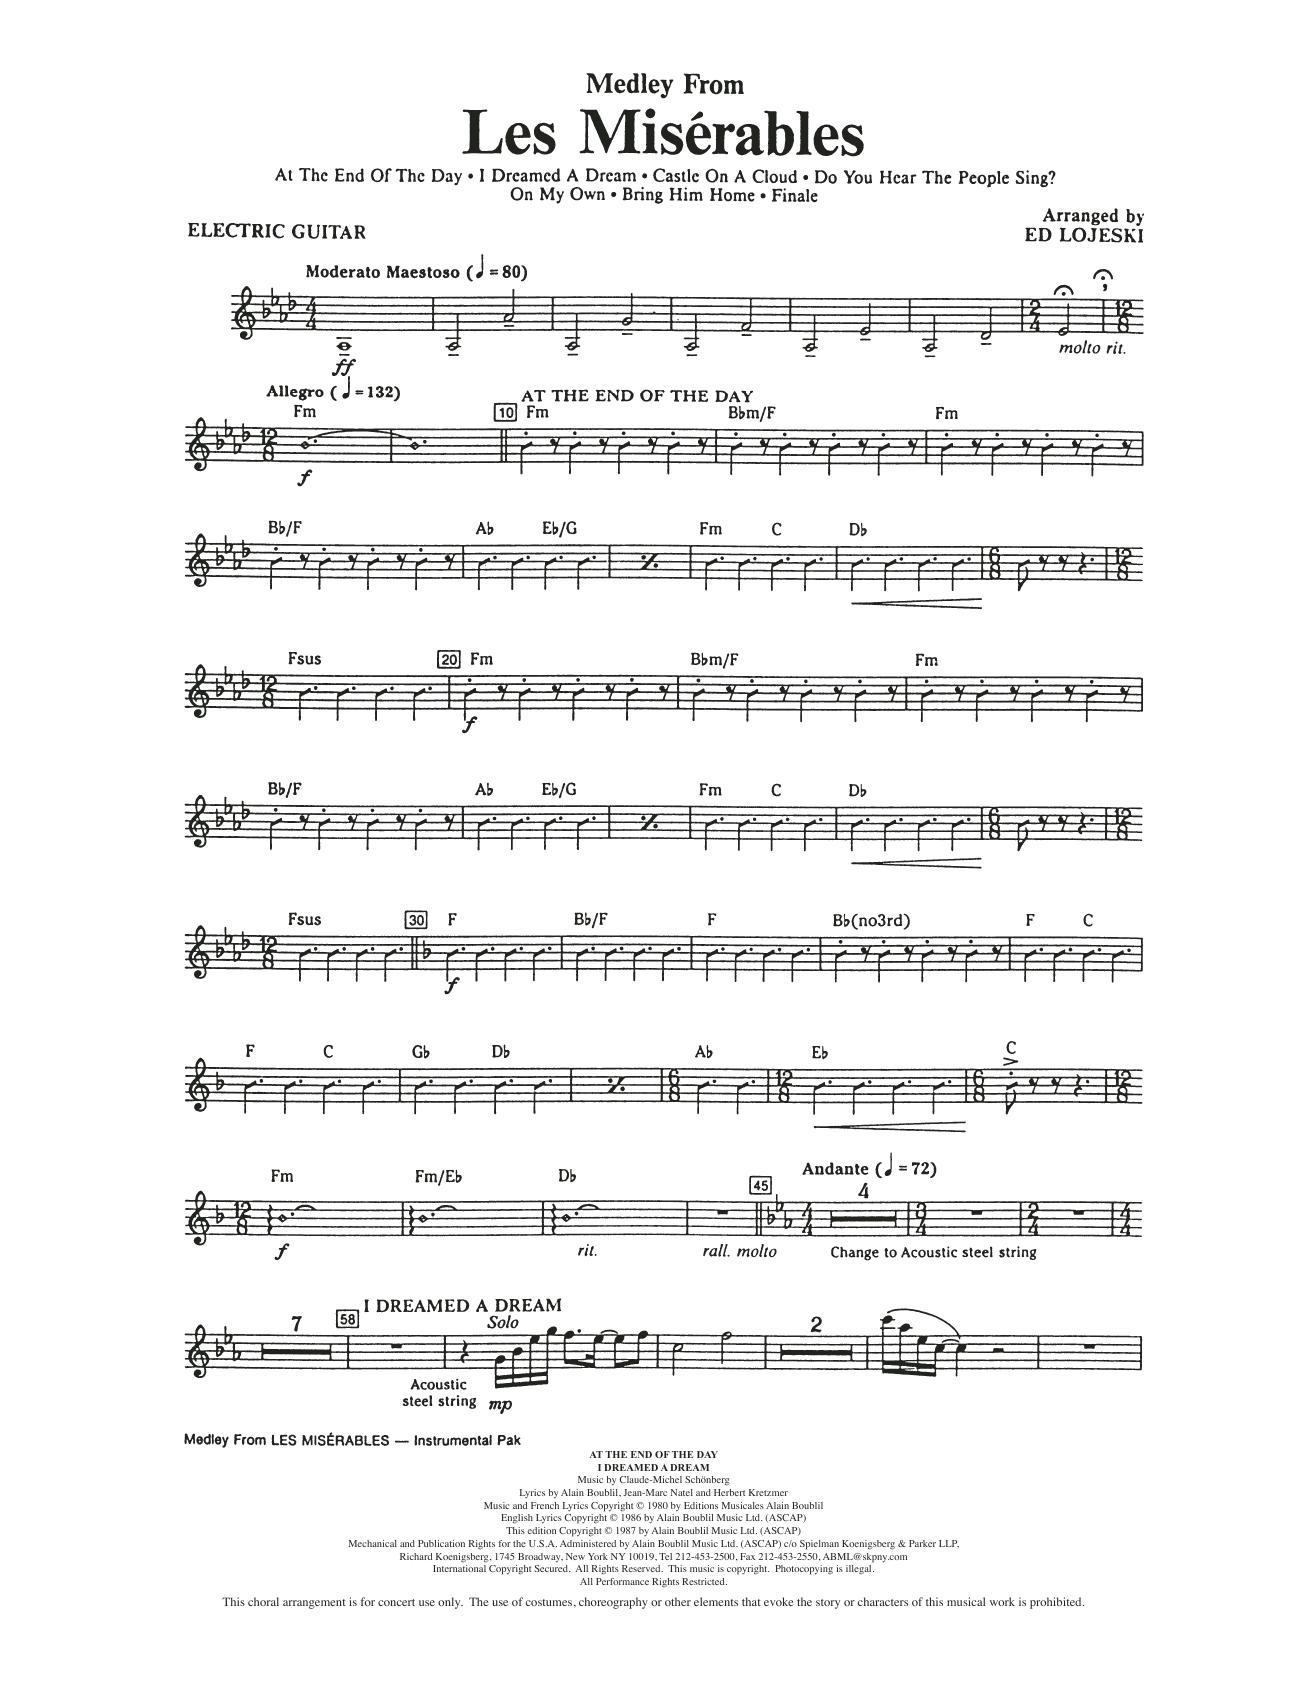 Boublil and Schonberg Les Miserables (Choral Medley) (arr. Ed Lojeski) - Electric Guitar sheet music notes and chords. Download Printable PDF.